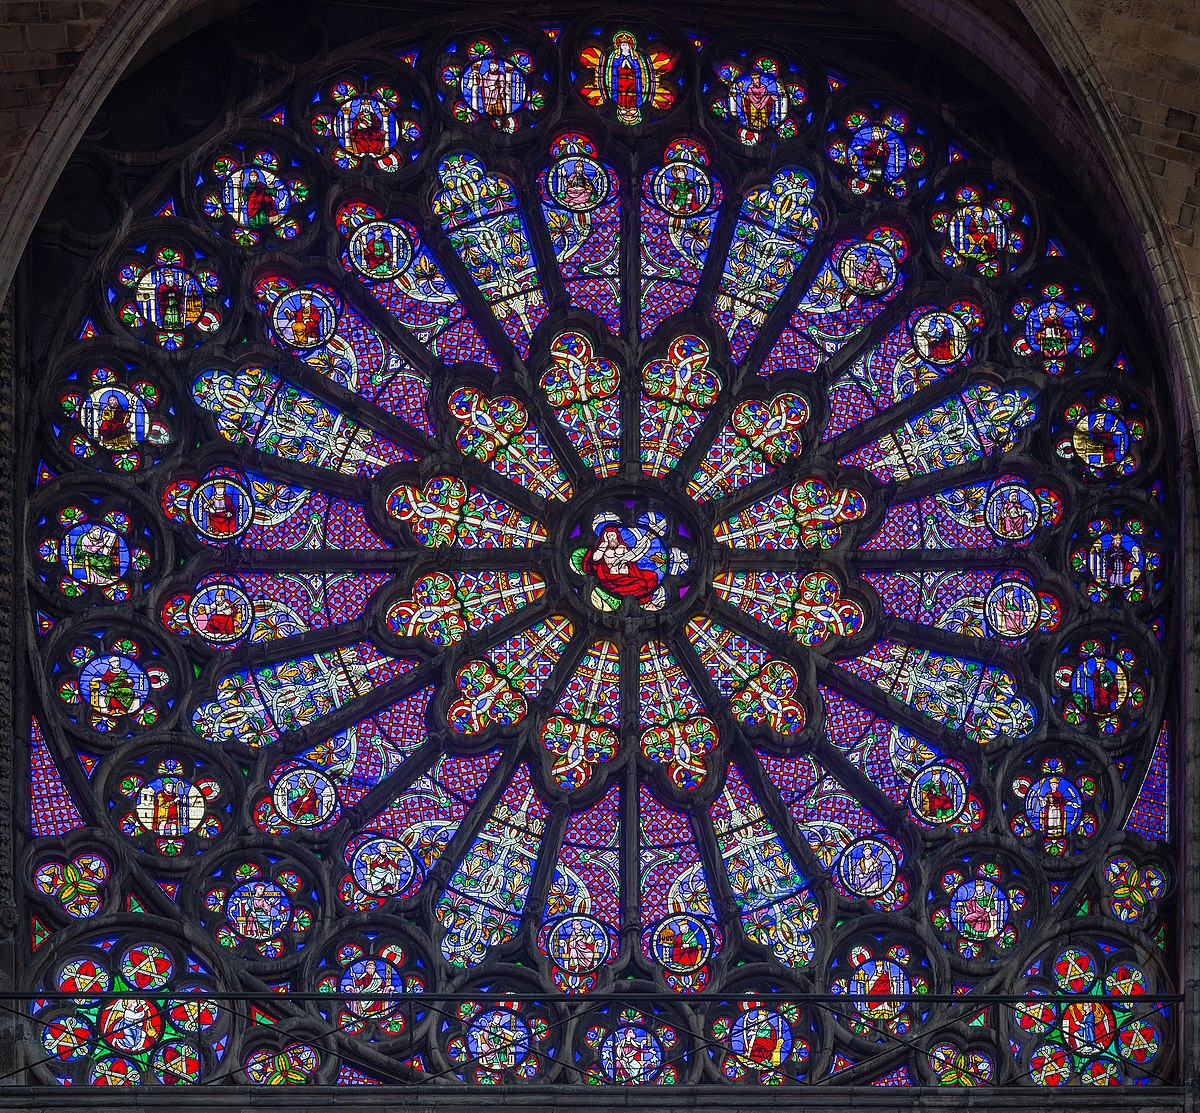 1200px-Basilica-of-Saint-Denis-Rayonnant-Rose-Window.jpg